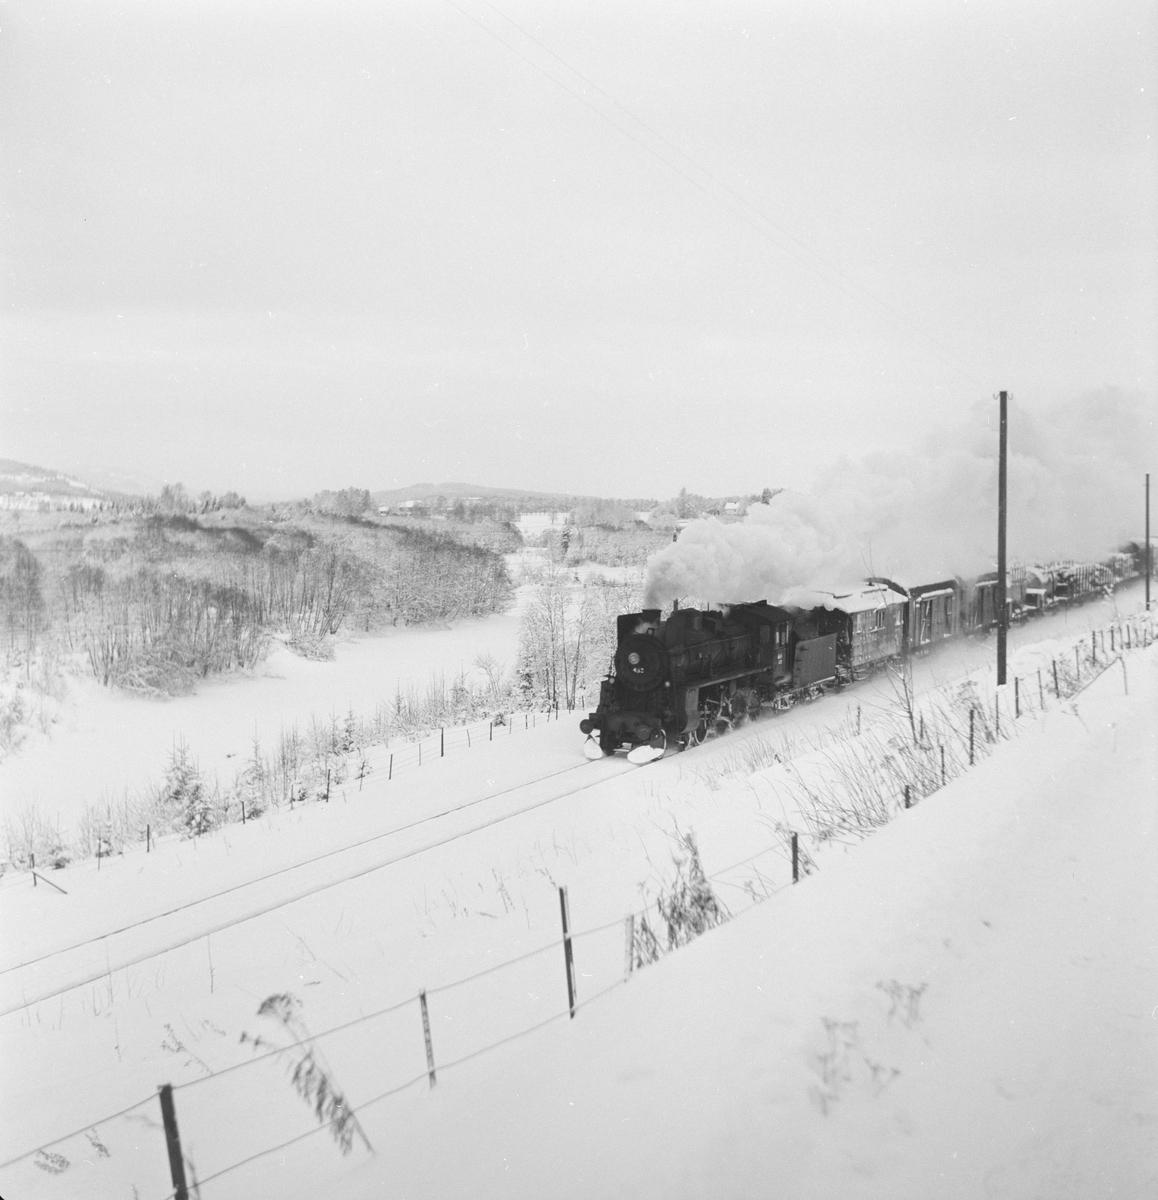 Godstog på Solørbanen trukket av damplokomotiv 26c nr. 433.